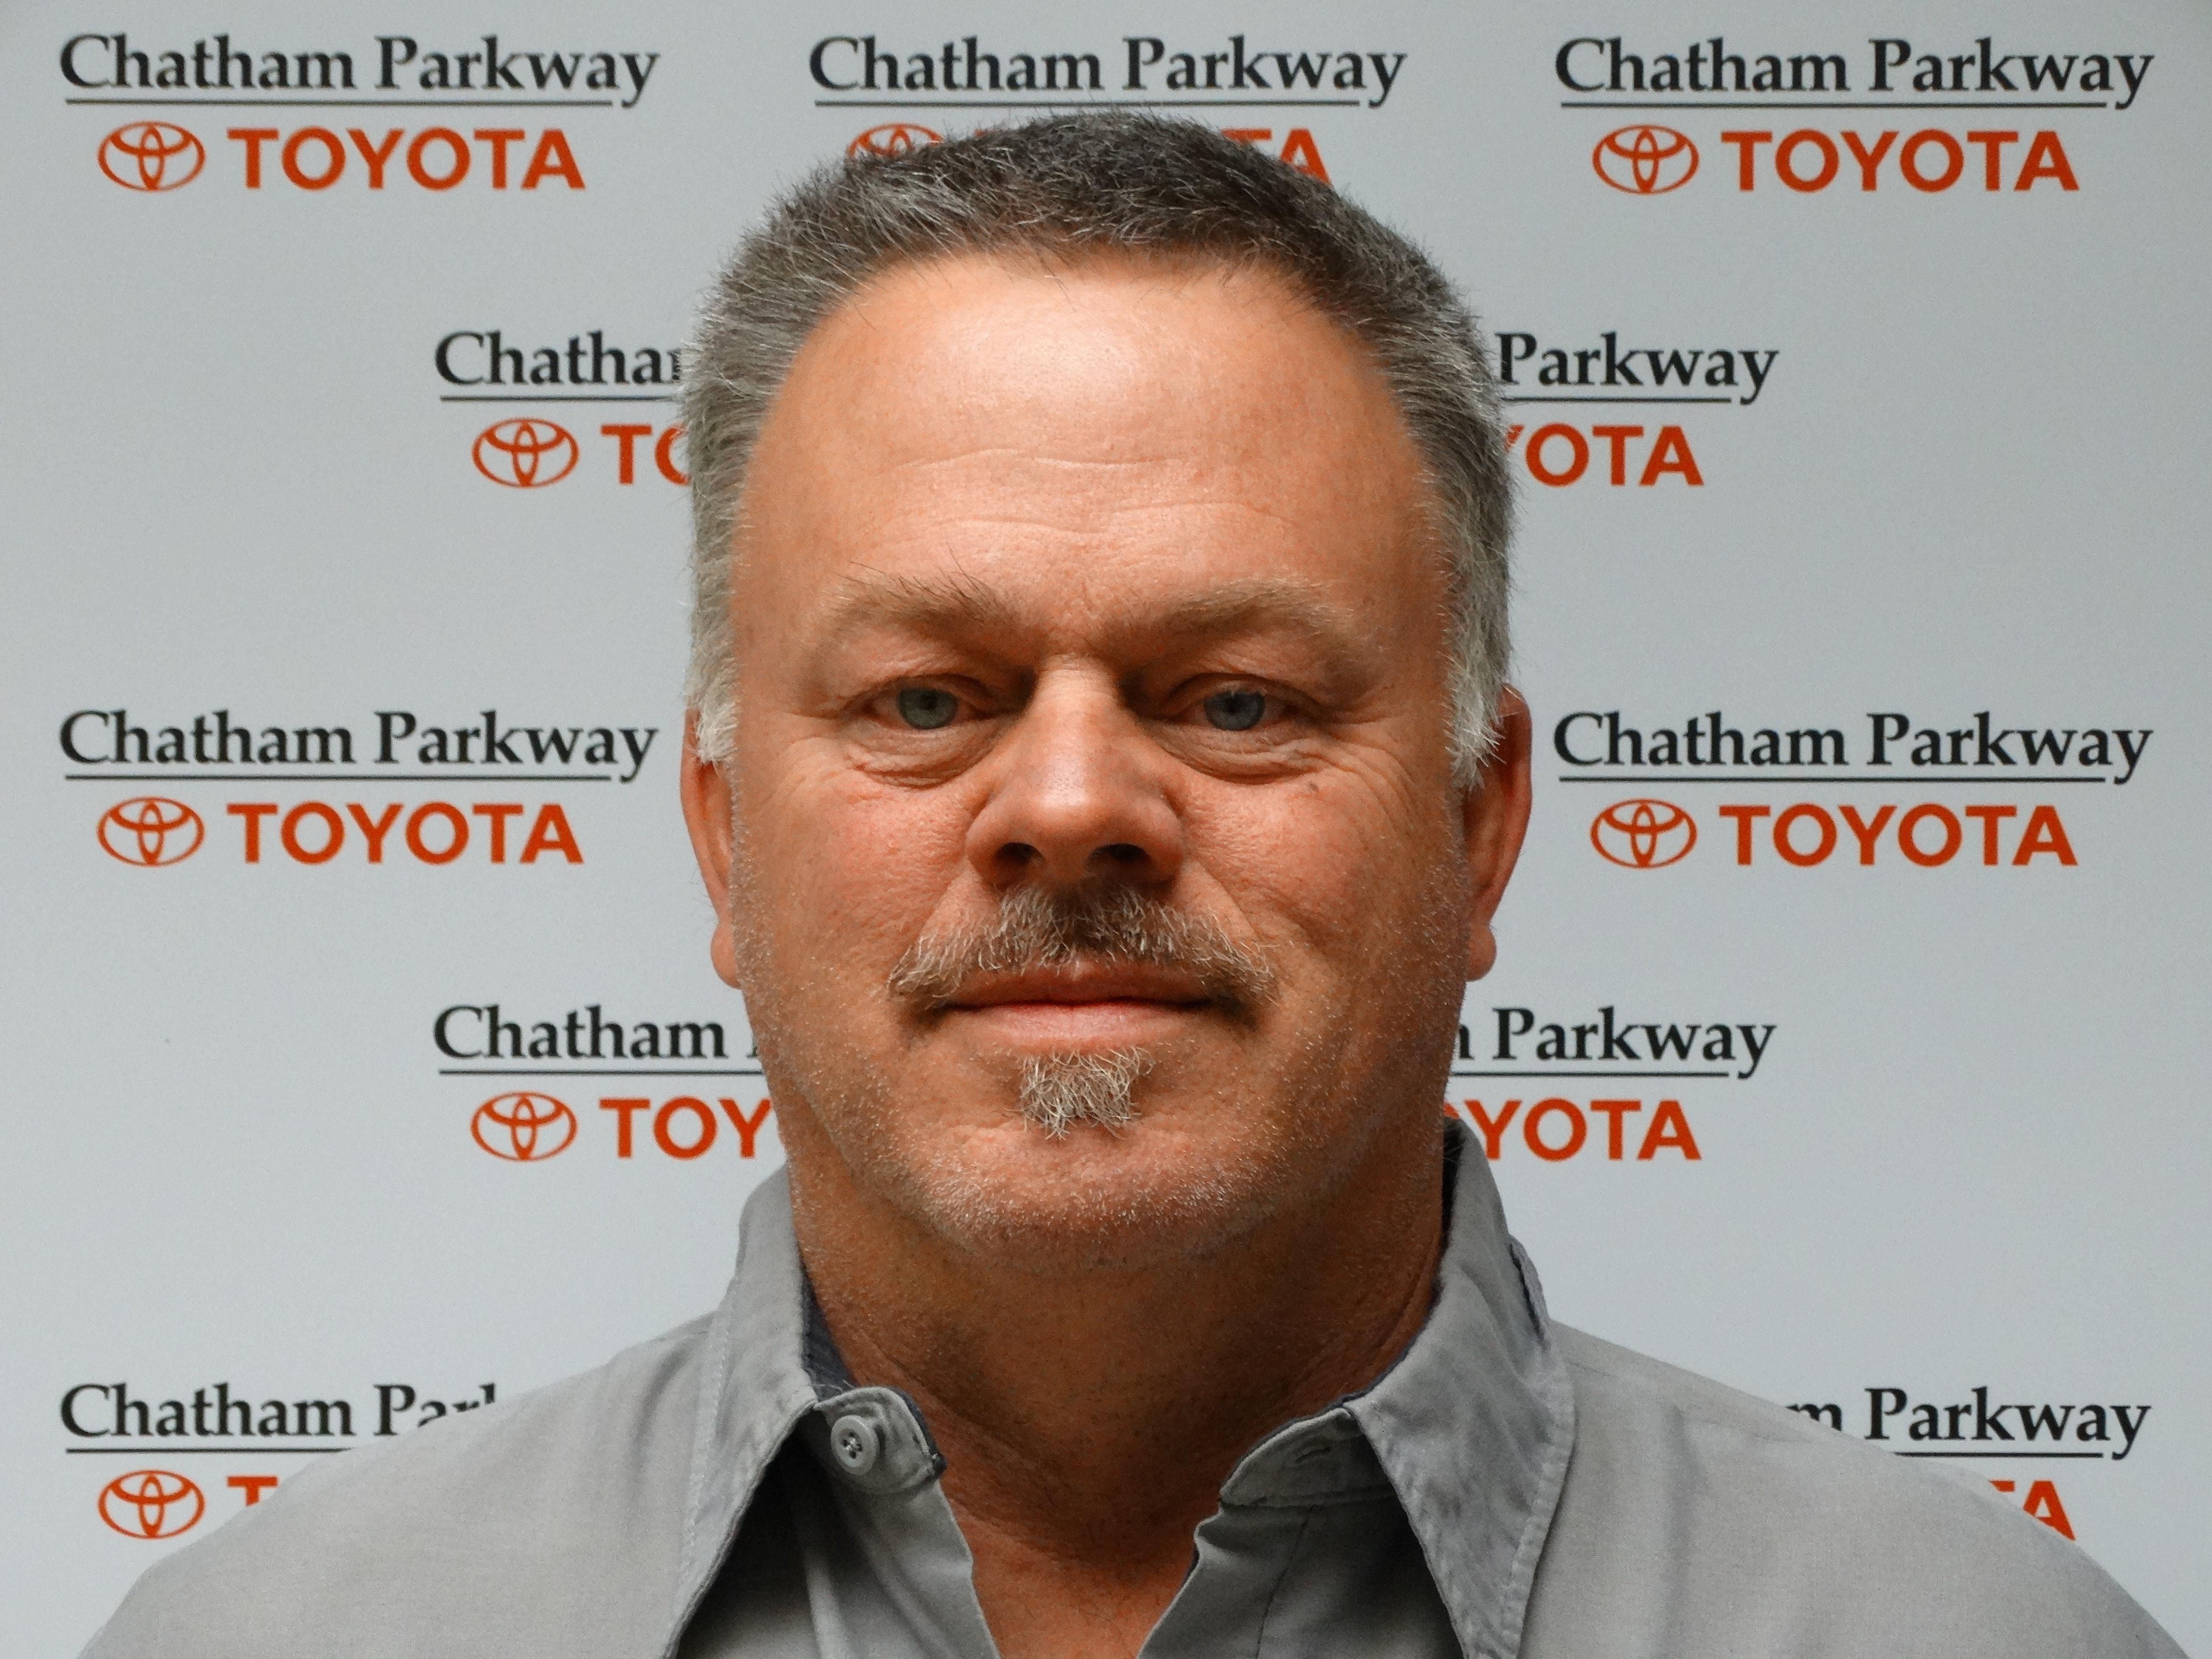 Chris Lathrop - Body Technician